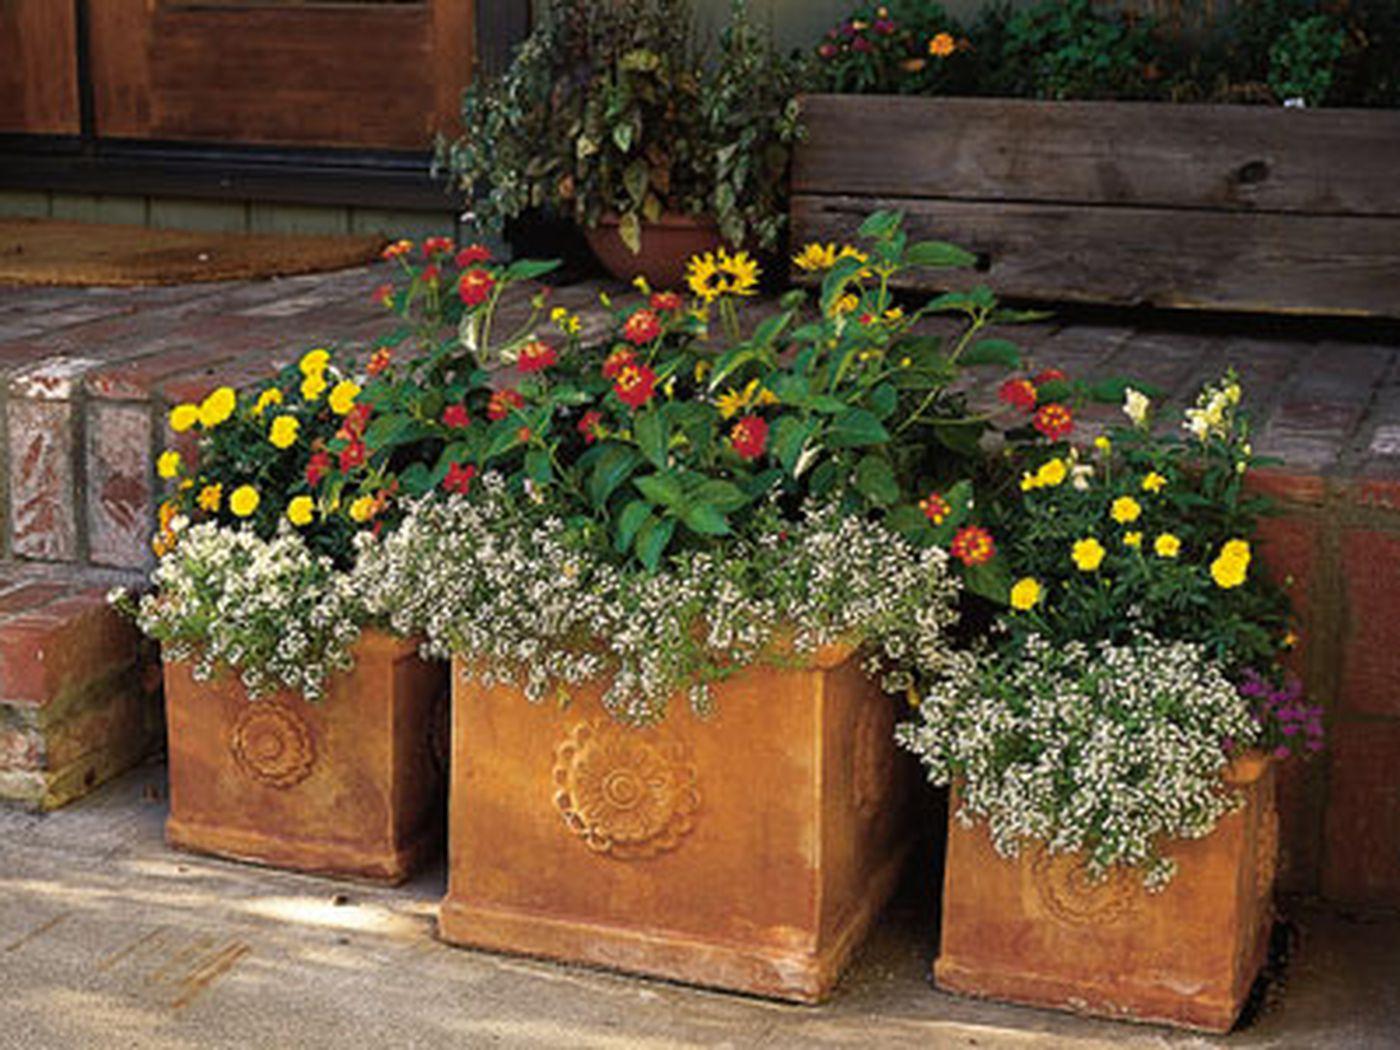 Plant Flower Pot Garden Holder Pots Planter Herb Coloured Home Garden Decor NEW#